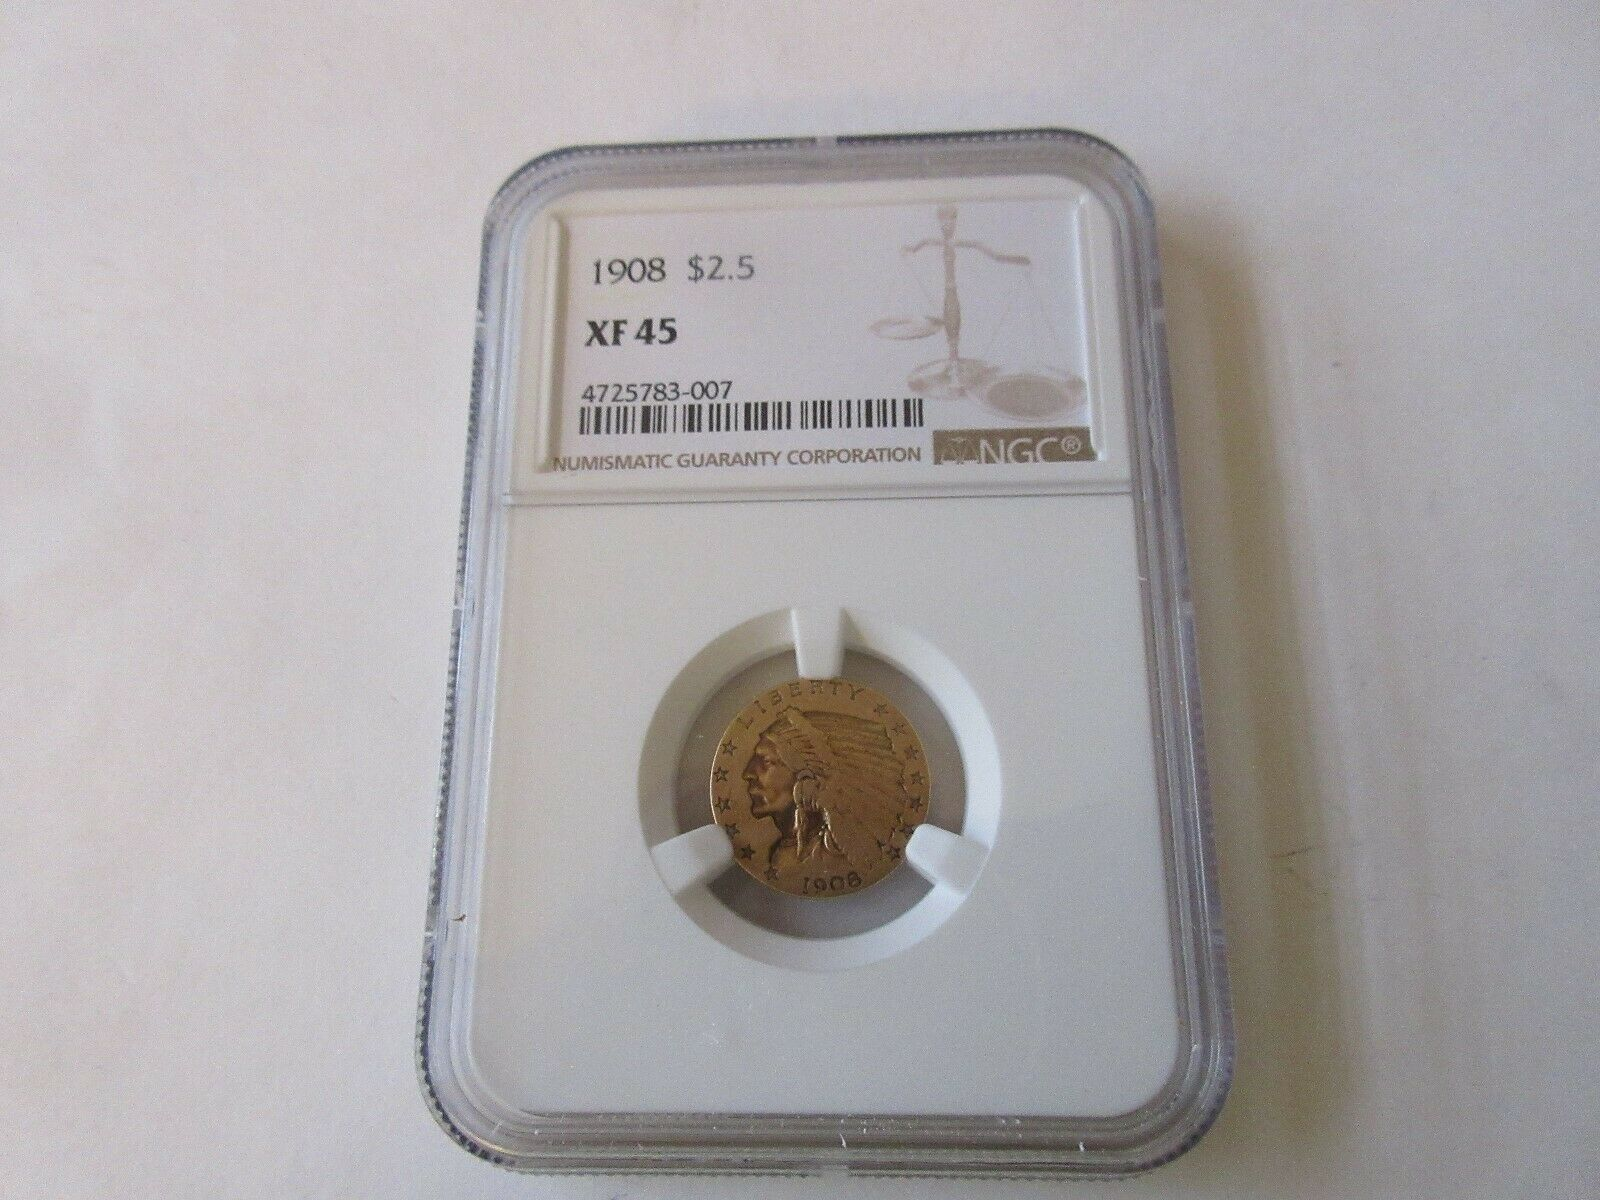 1908 $2.5 Gold XF 45 Indian Head Quarter Eagle NGC